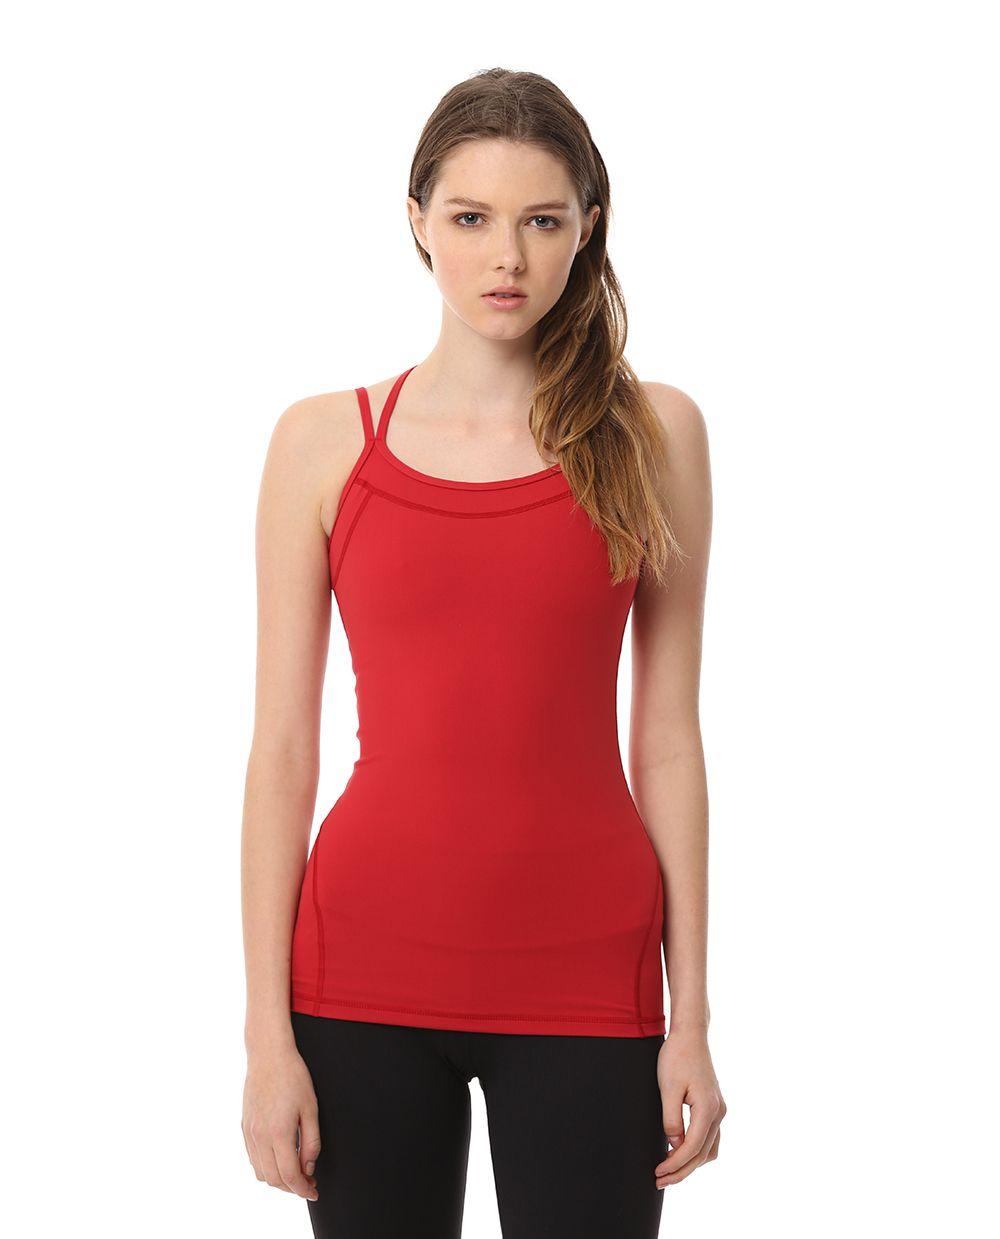 AUMNIE :: EDGE TANK HEART  #yoga #pilates #yogatank #yogatop #yogawear #fittnesswear #sportswear